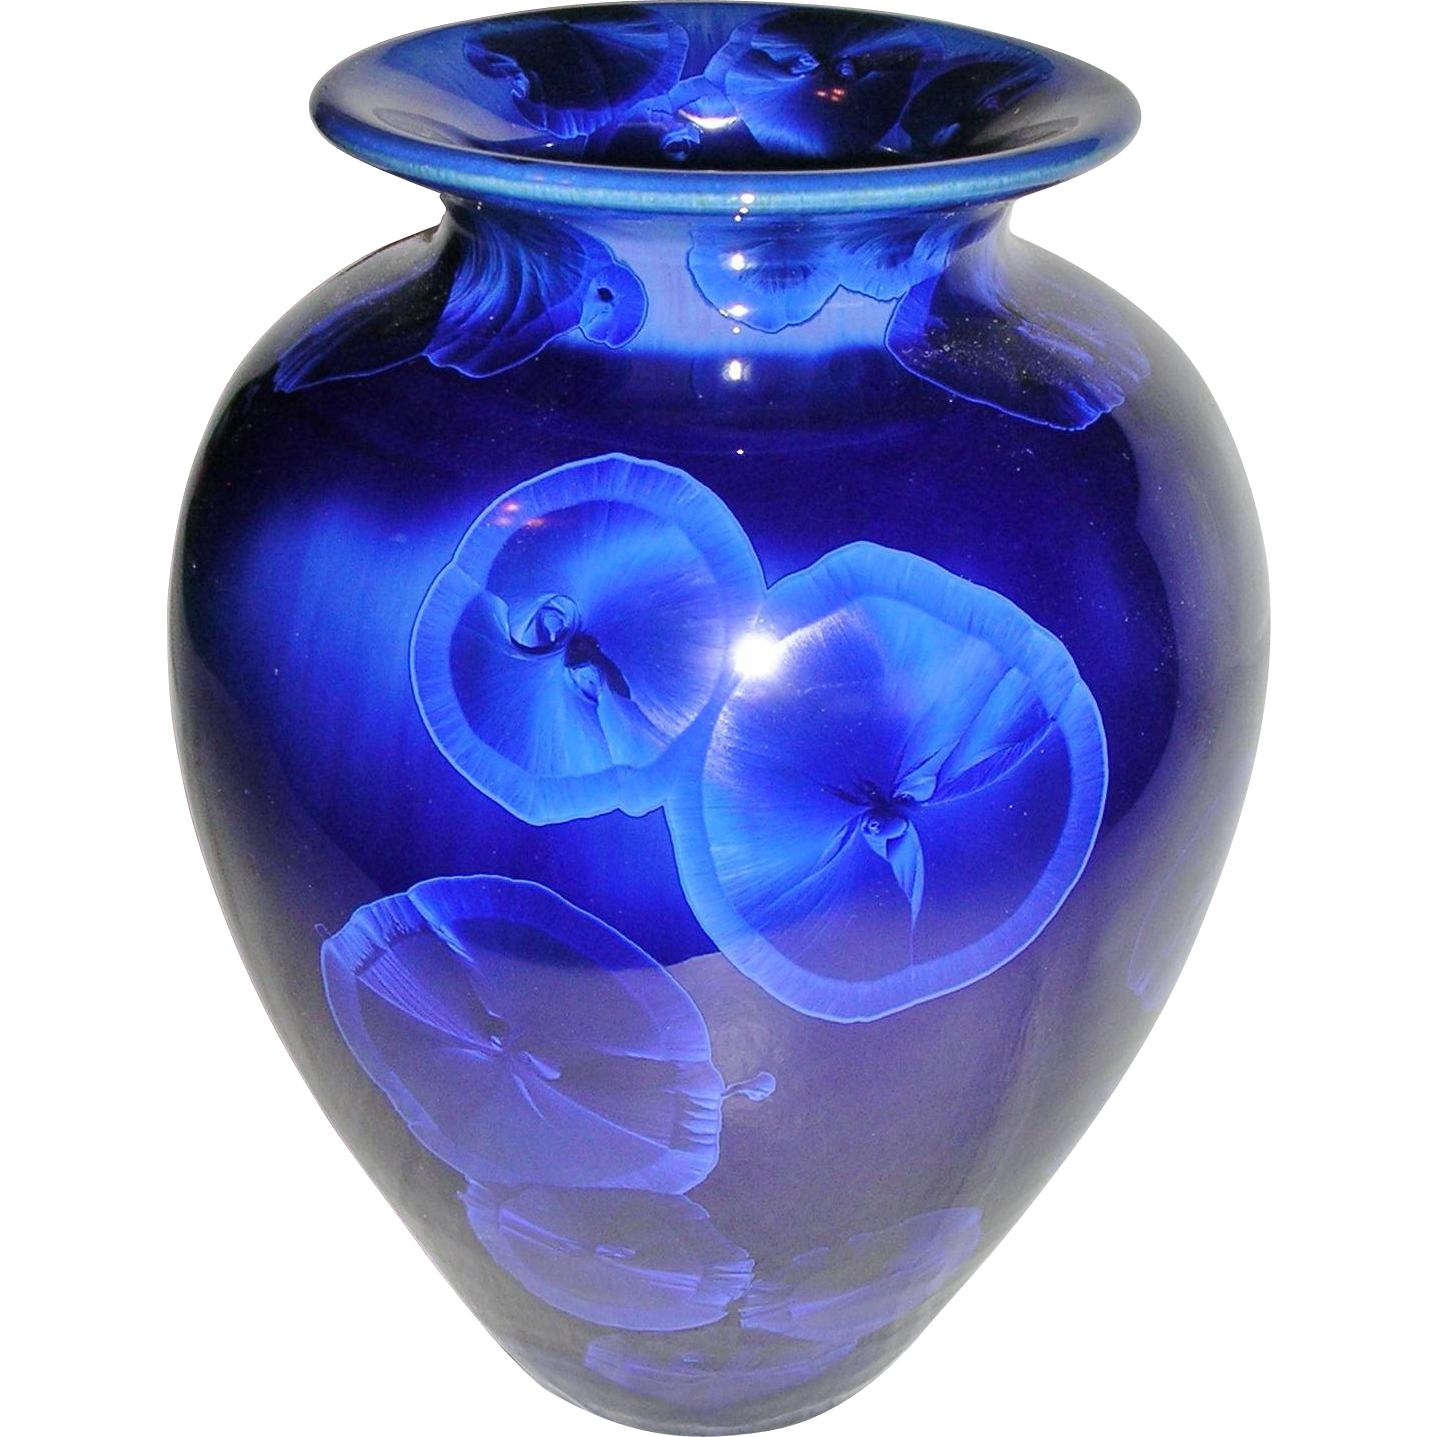 Exquisite john mankameyer manka studio crystalline glaze art vase exquisite john mankameyer manka studio crystalline glaze art vase hidden in the hills ruby lane reviewsmspy